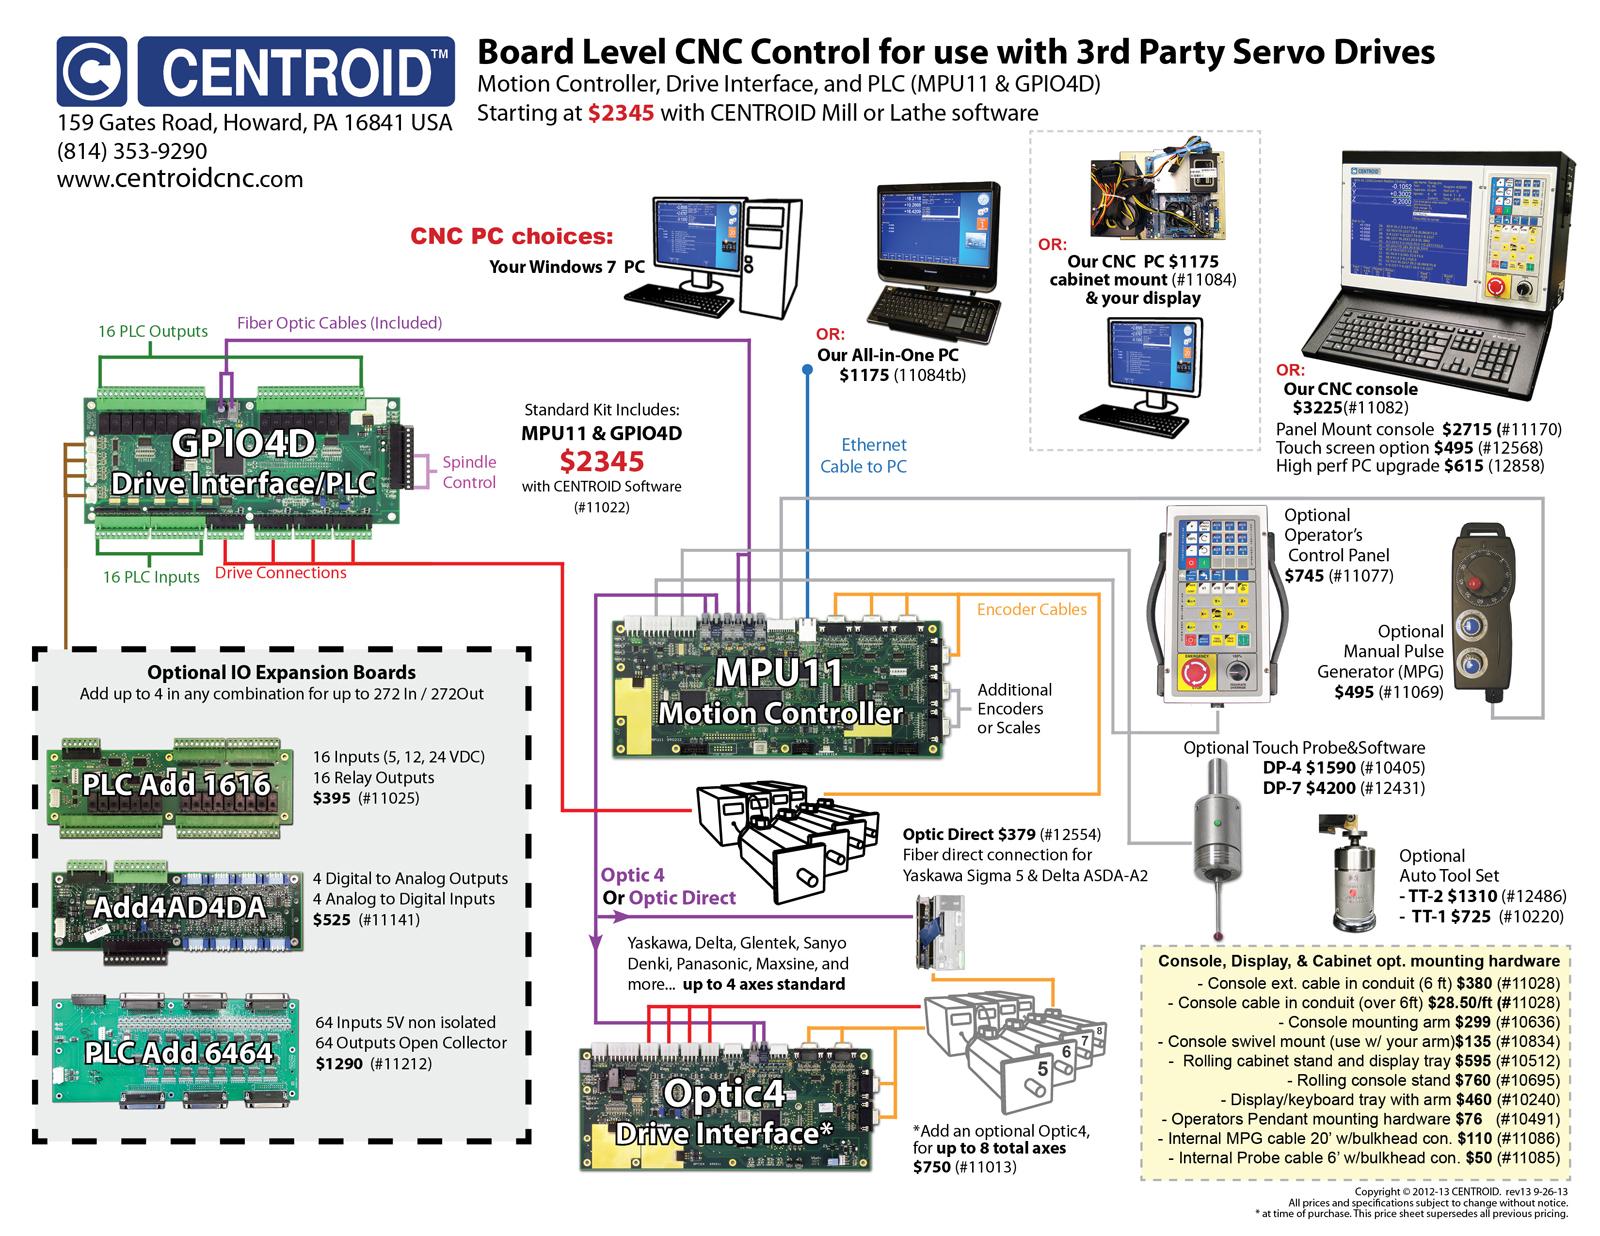 CENTROID CNC Control Features, USB Port For USB Storage